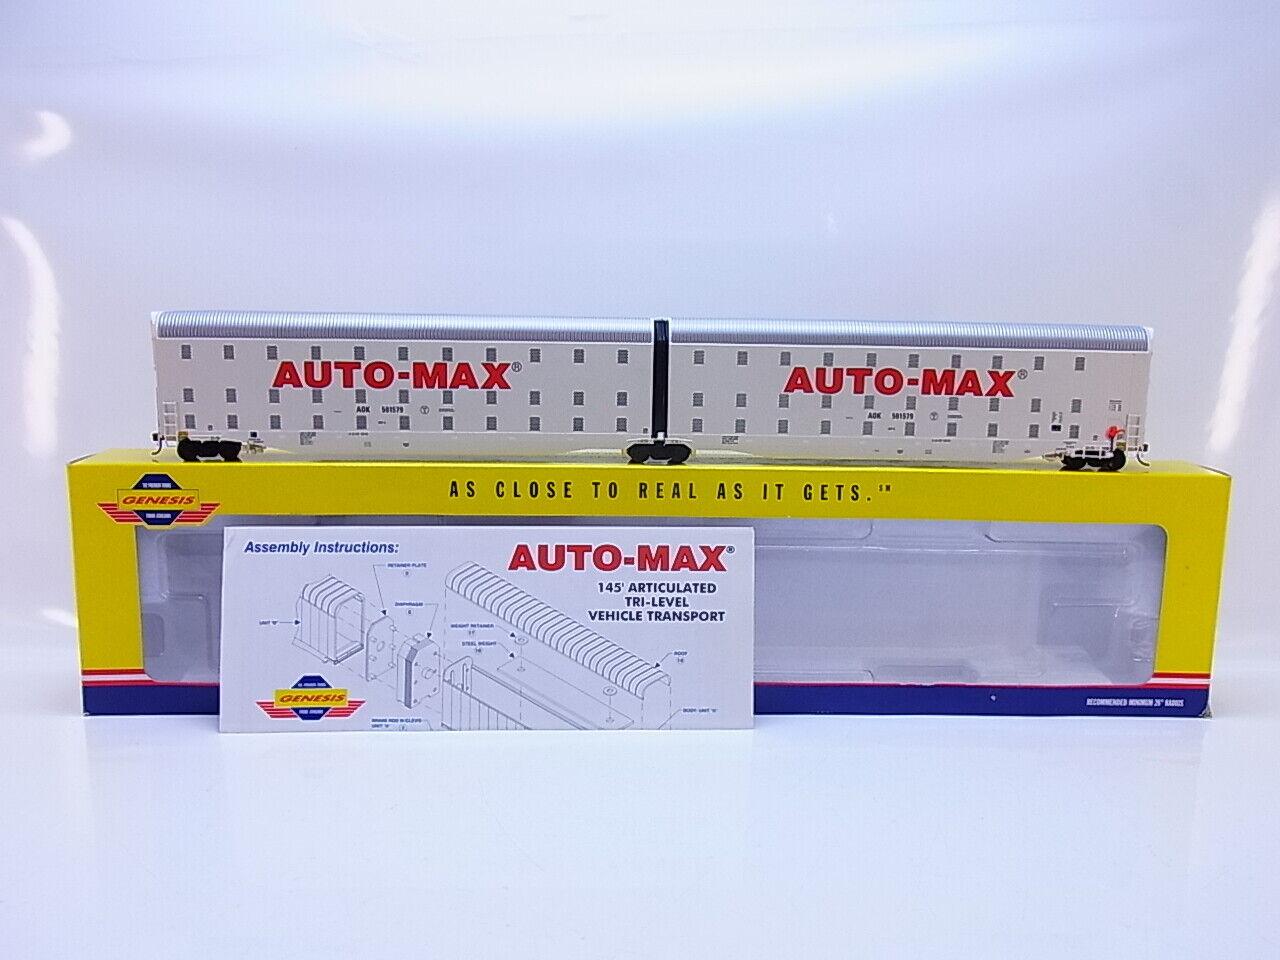 55176 expositor Athearn Genesis h0 g4402 us AOK RR auto-Max AOK 501579 en OVP